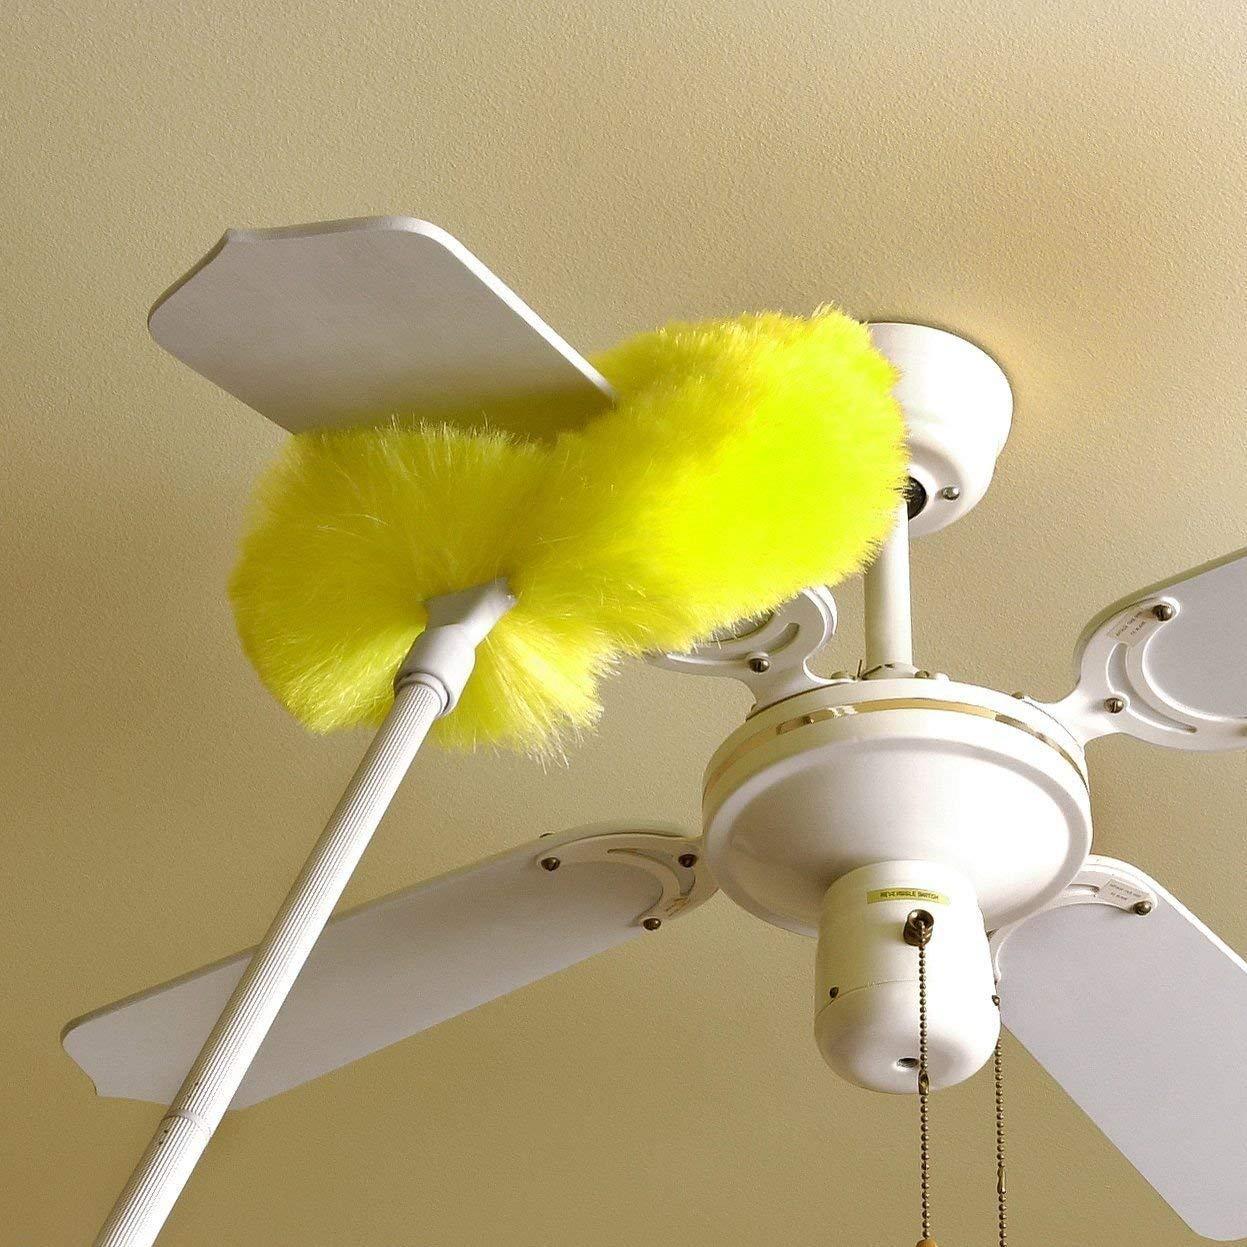 Amazon.com : Hampton Direct Ceiling Fan Duster Electromagnetic 47 ...